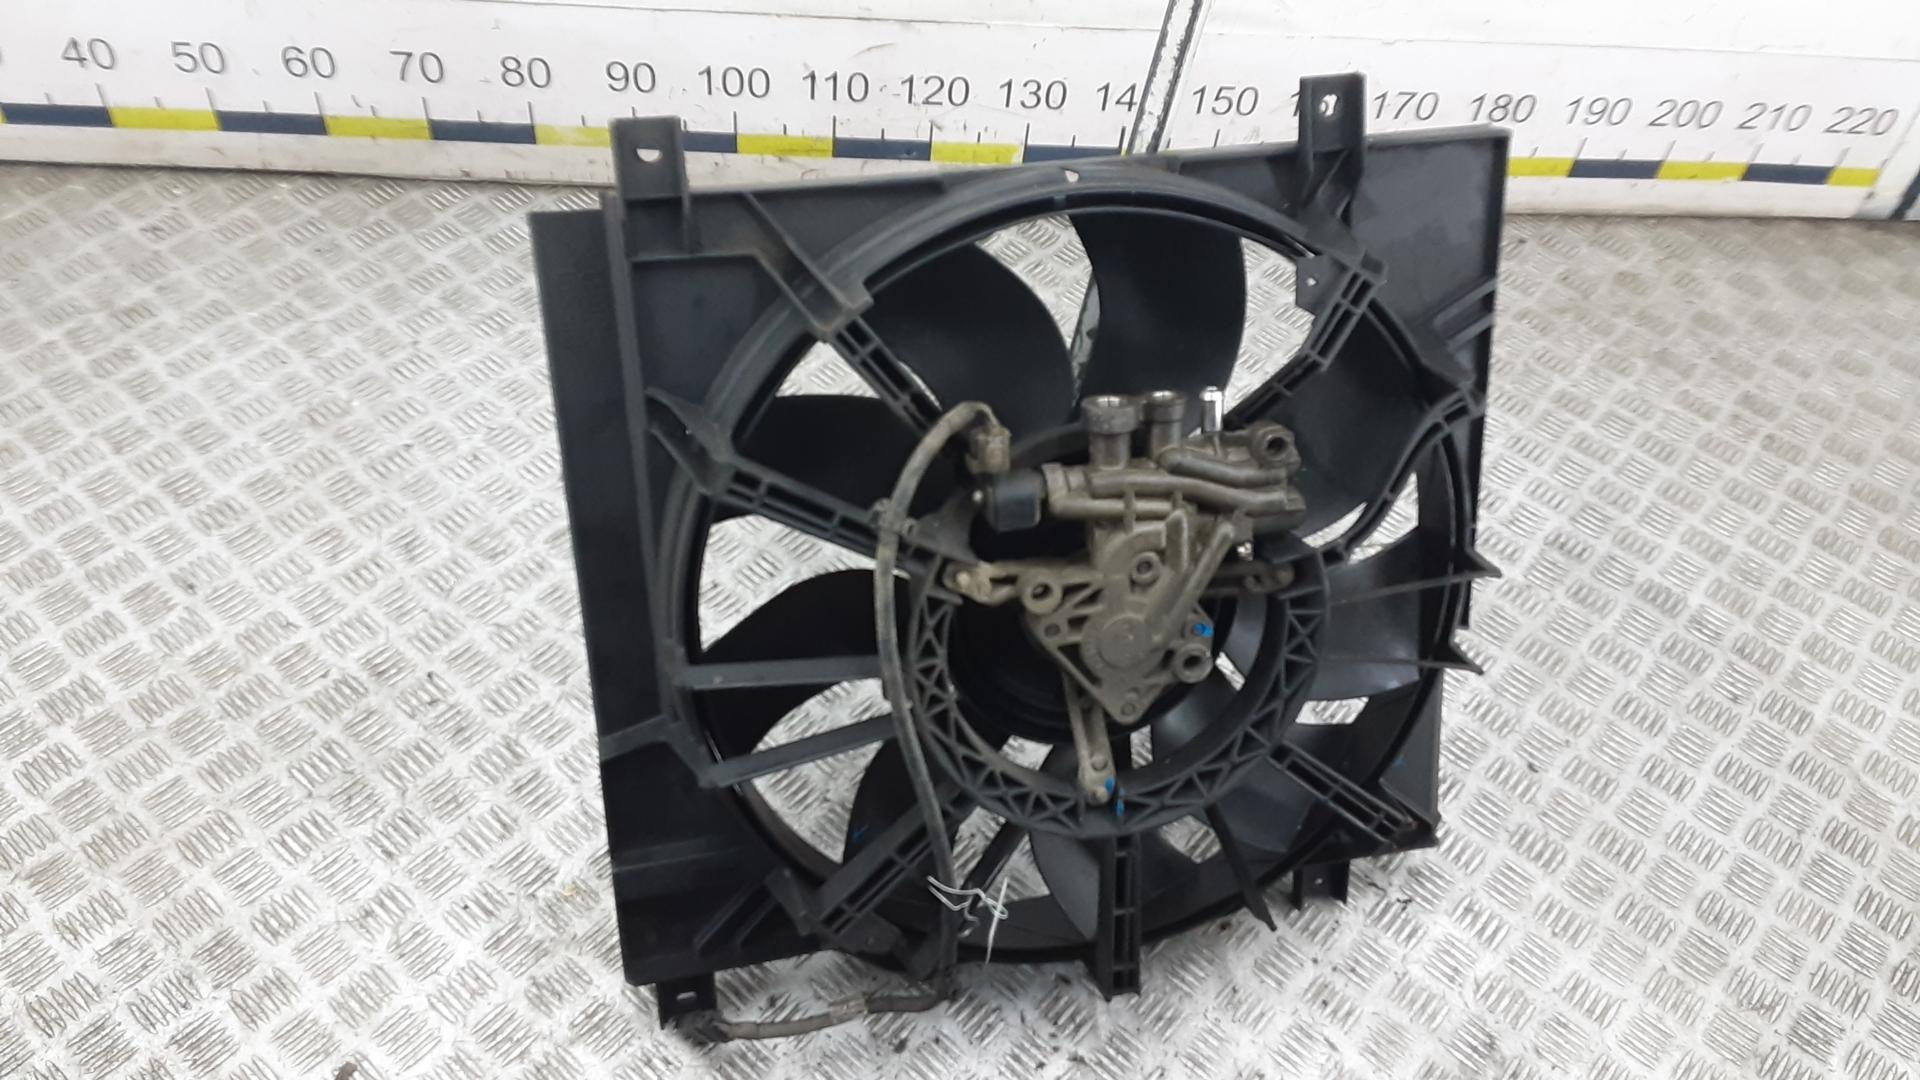 Вентилятор радиатора, JEEP, GRAND CHEROKEE WJ, 2004